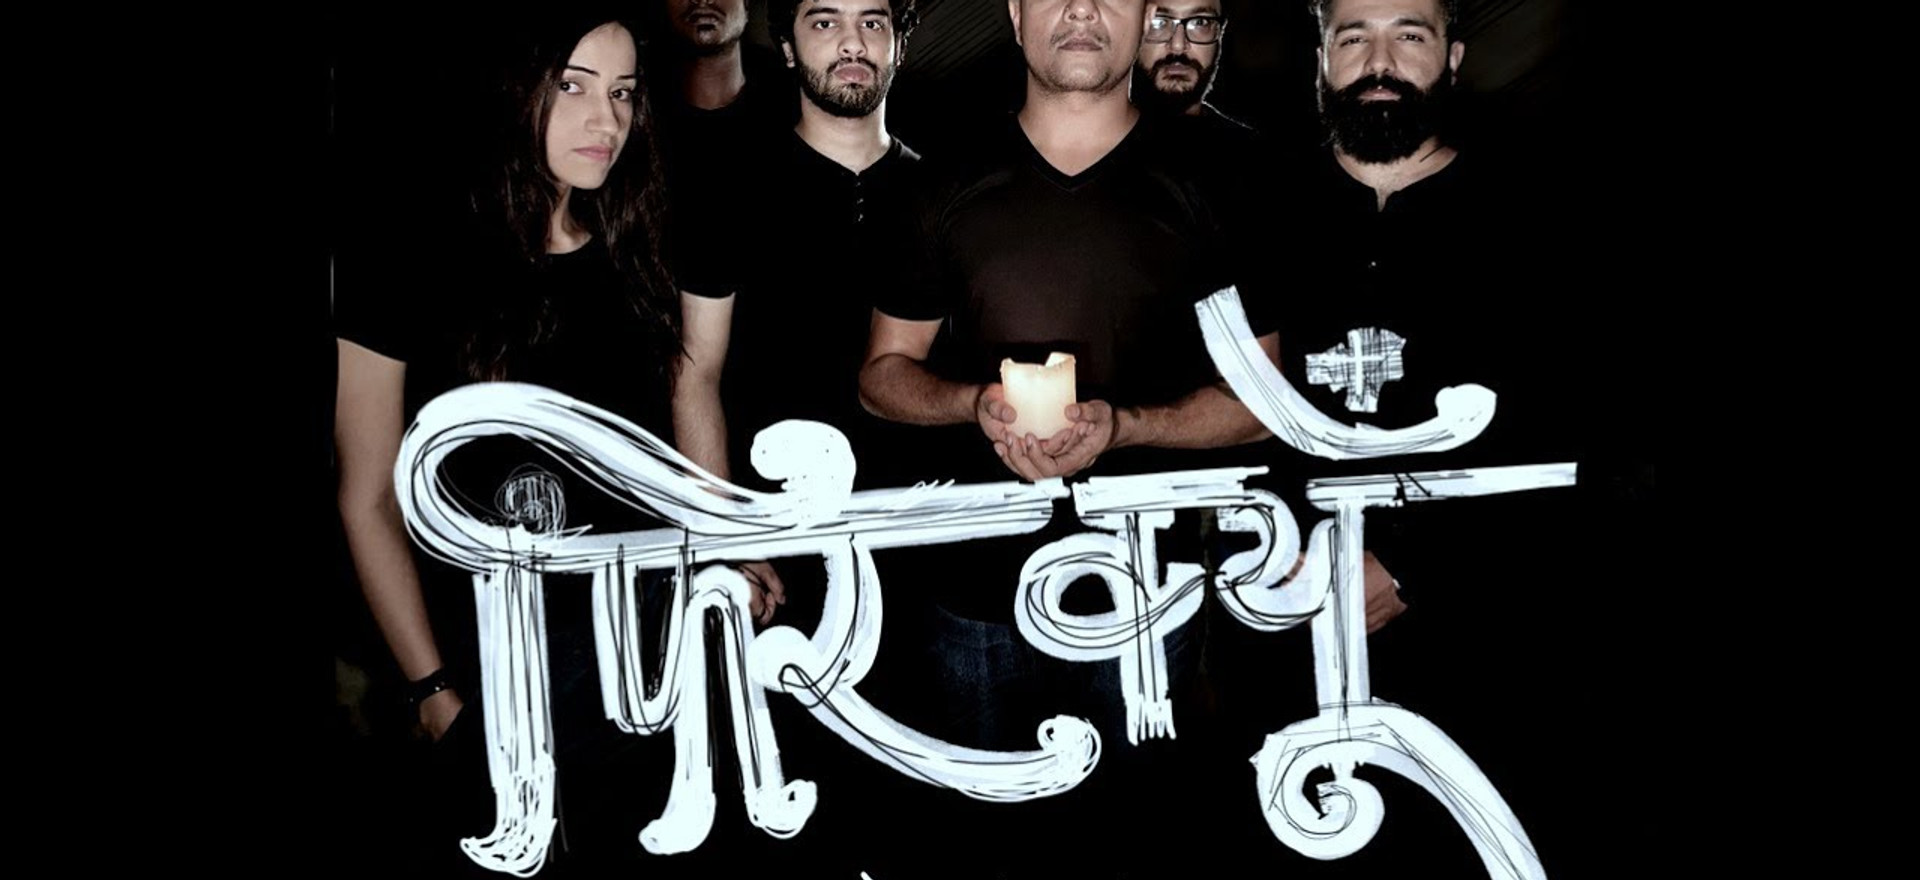 PHIR KYUN /Official Music Video - Sharma And The Besharams feat. Siddharth Basrur